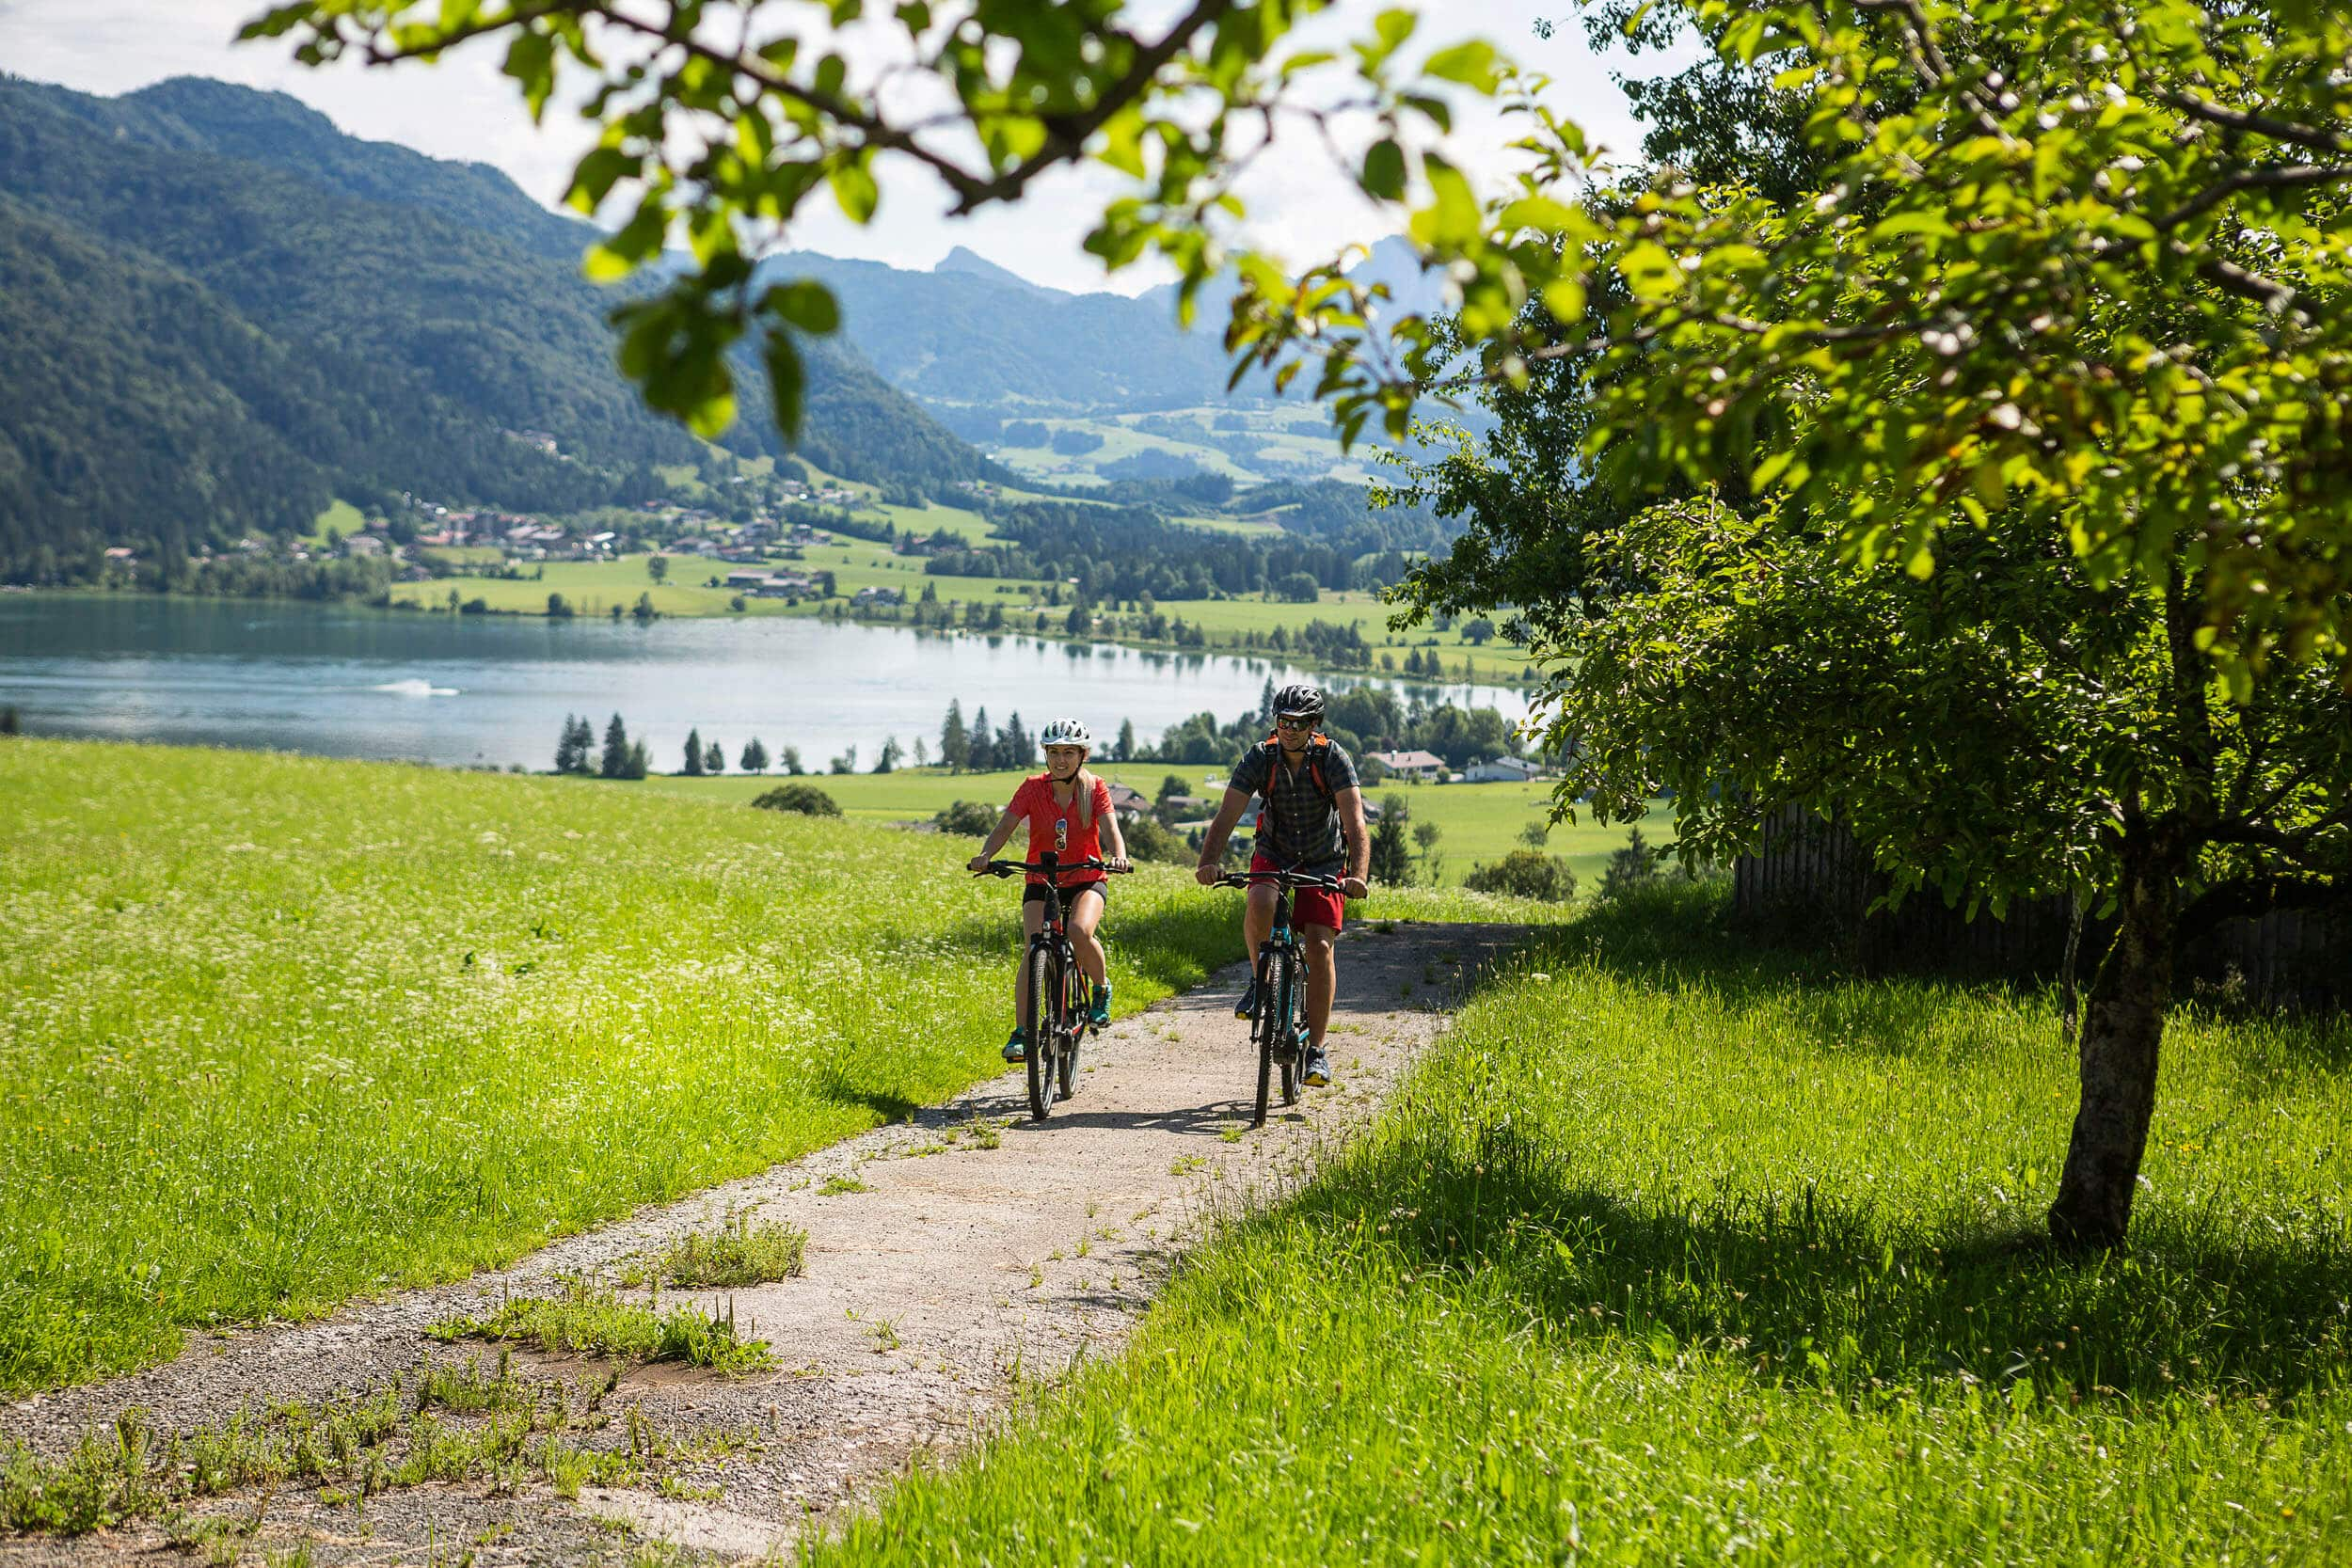 Fahrradtour entlang des Walchsees im Kaiserwinkl © Velontour